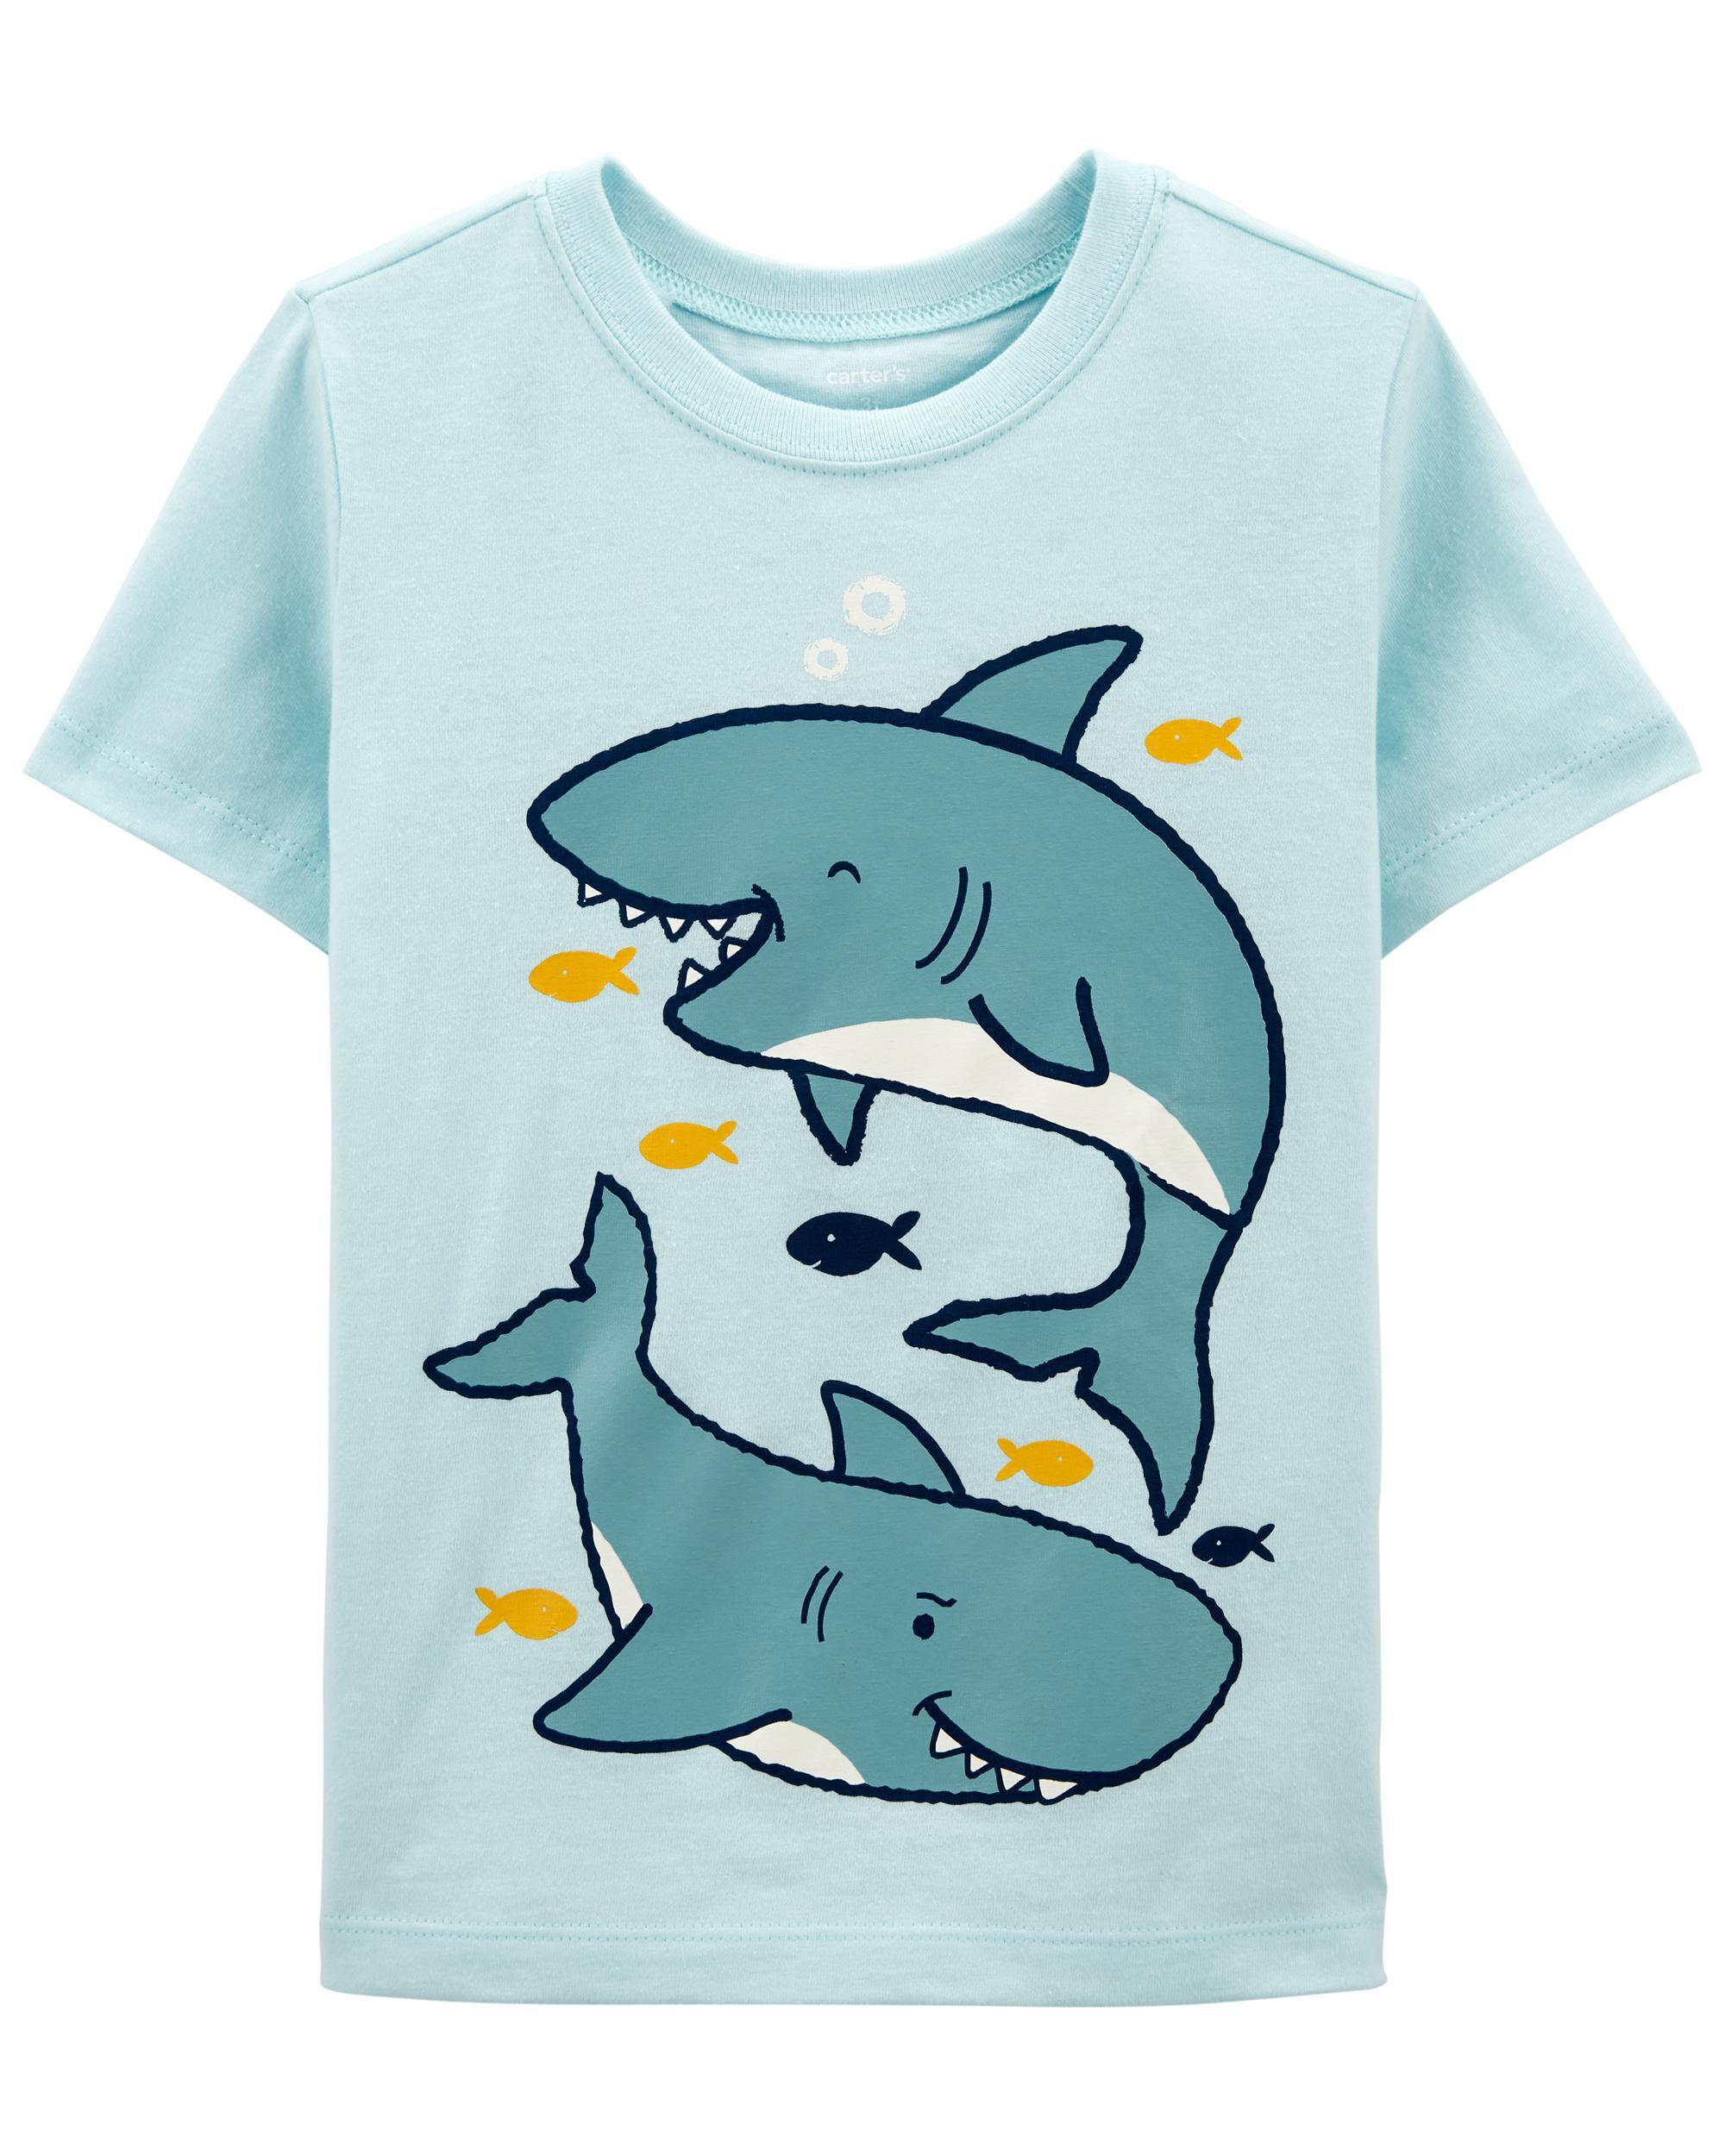 Carters Sharks Jersey Tee